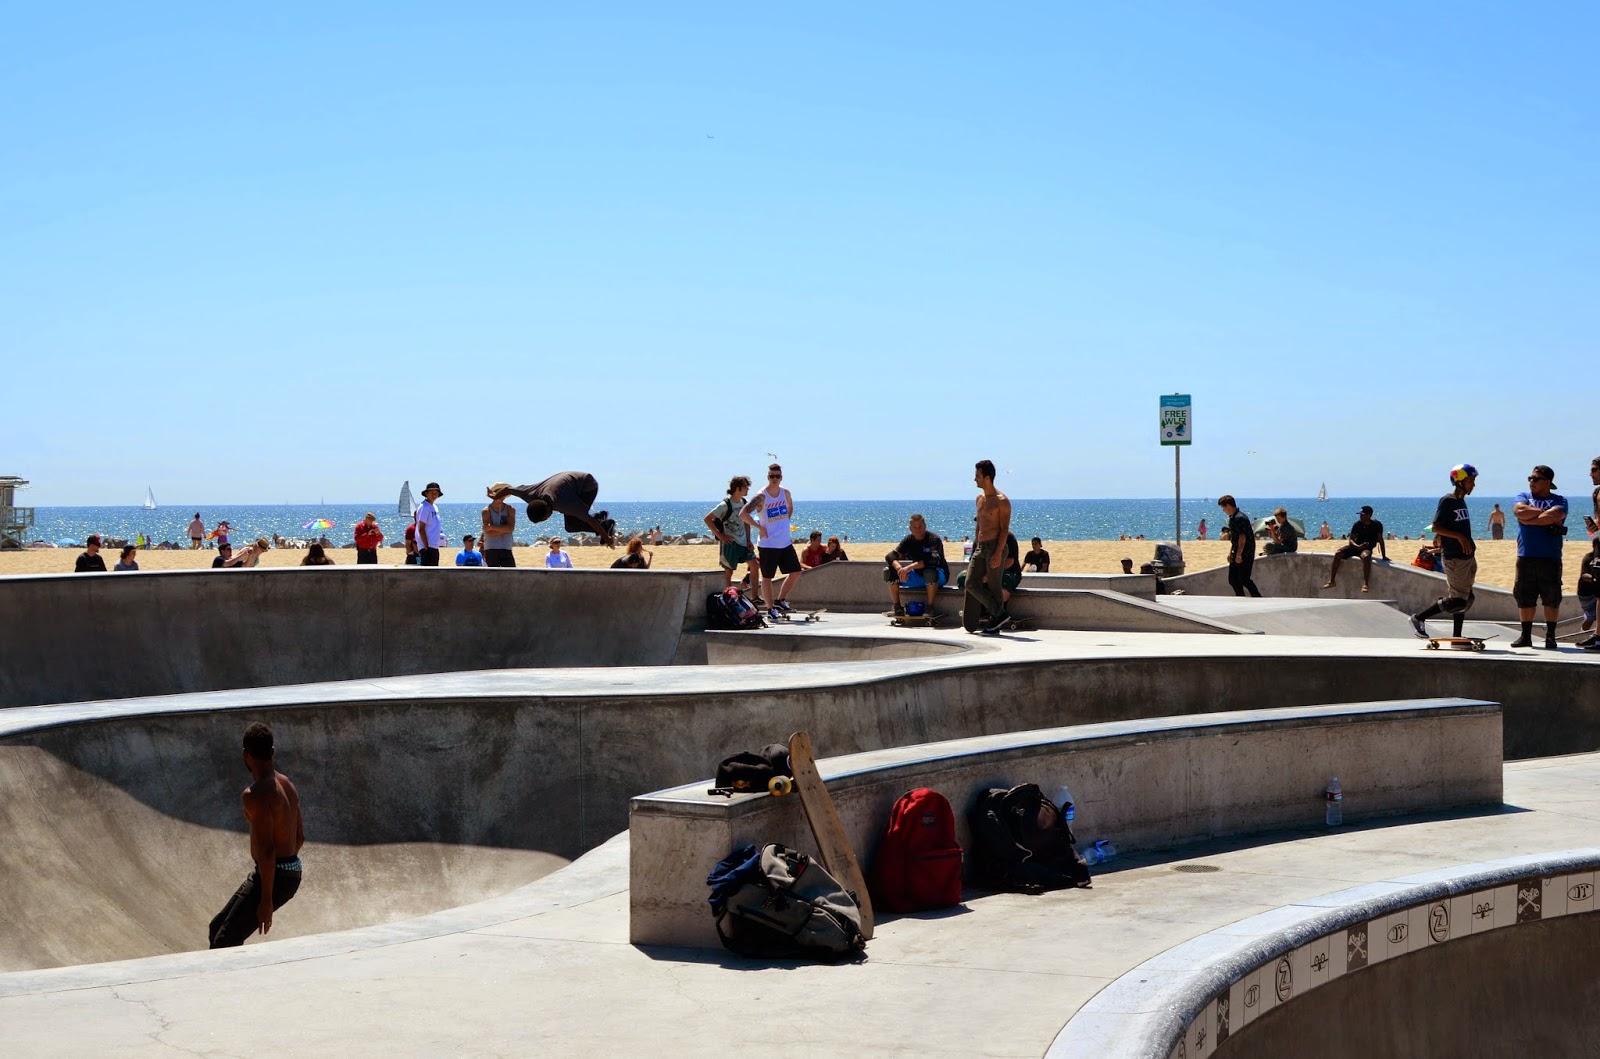 Rag & bone, denim high waisted skirt, denim skirt, off the shoulder top, spring style, Venice, Venice beach, LA, slide sandals, Matisse, DSW, black straw fedora, skate park in Venice Beach